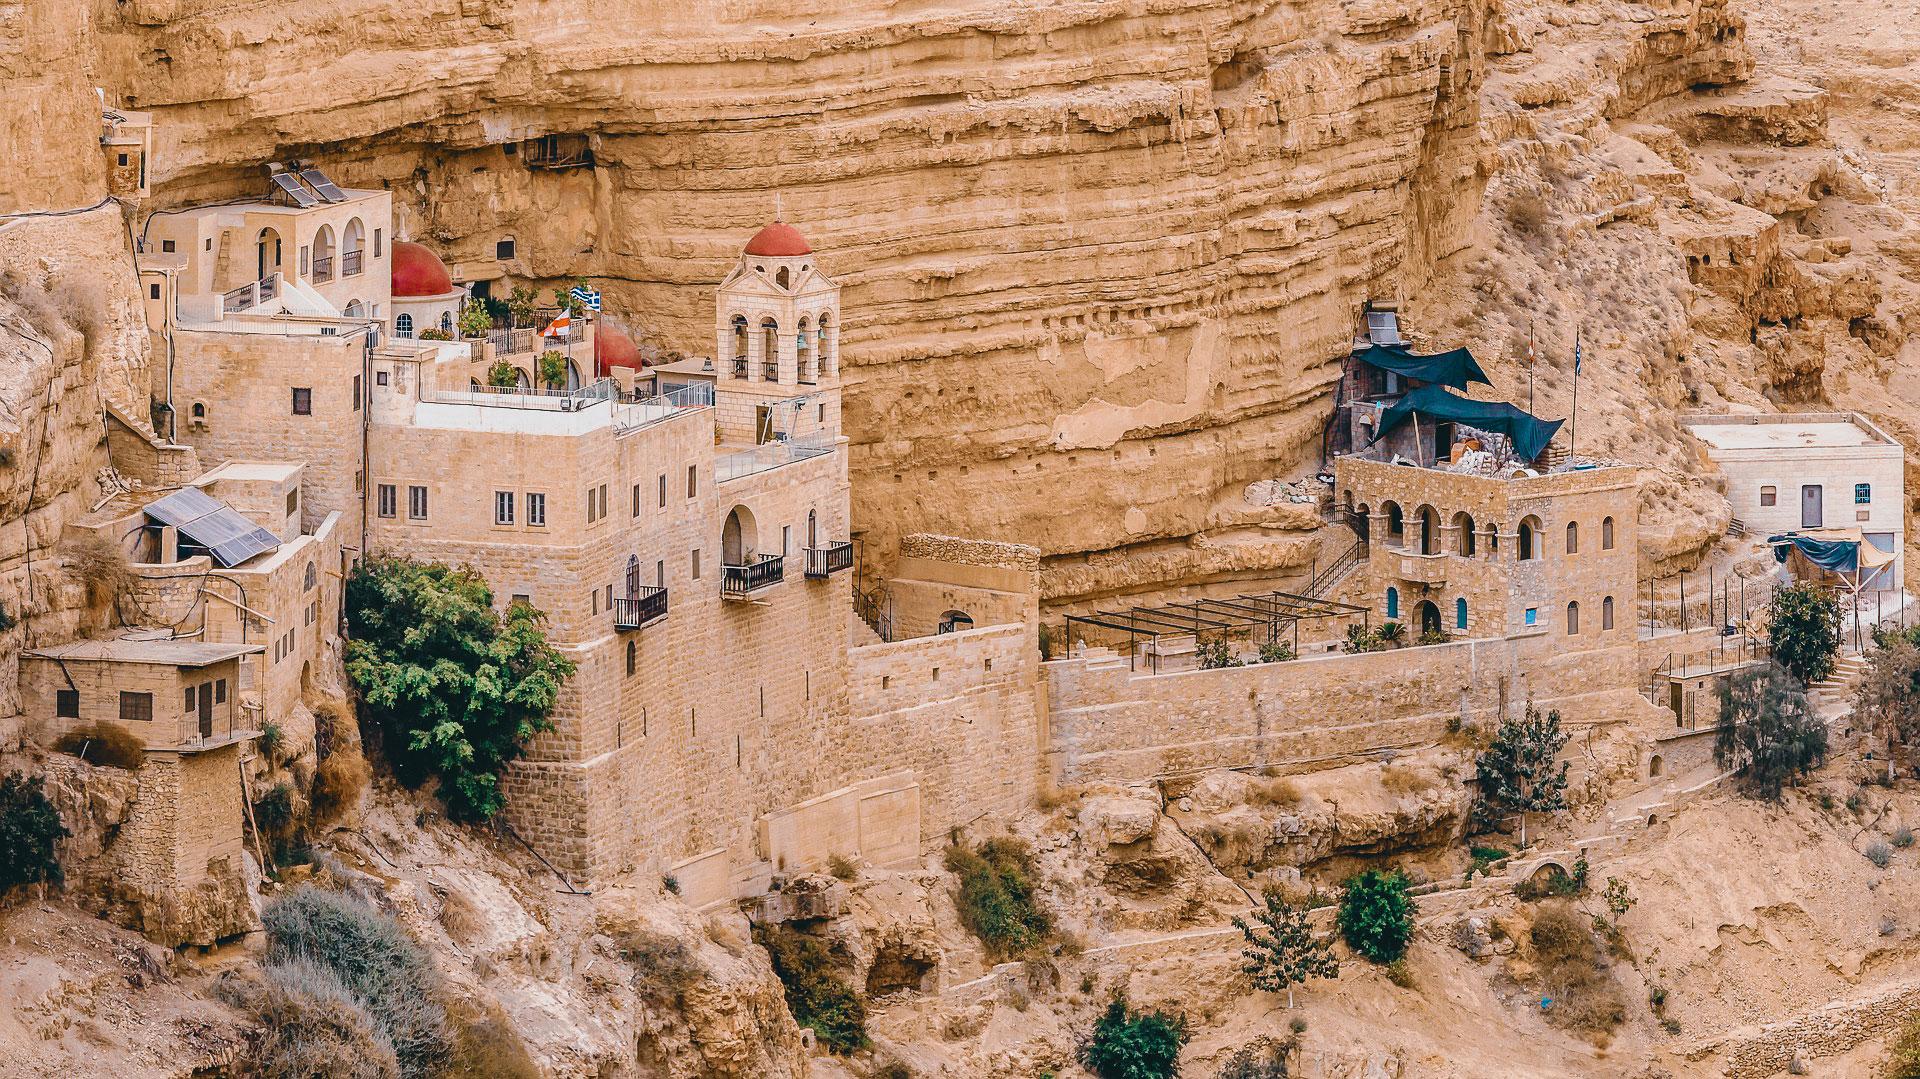 Nazaret – Kana Galilejska – Tabor – Tabgha – Kafarnaum – Jerihon – Betlehem – Jeruzalem